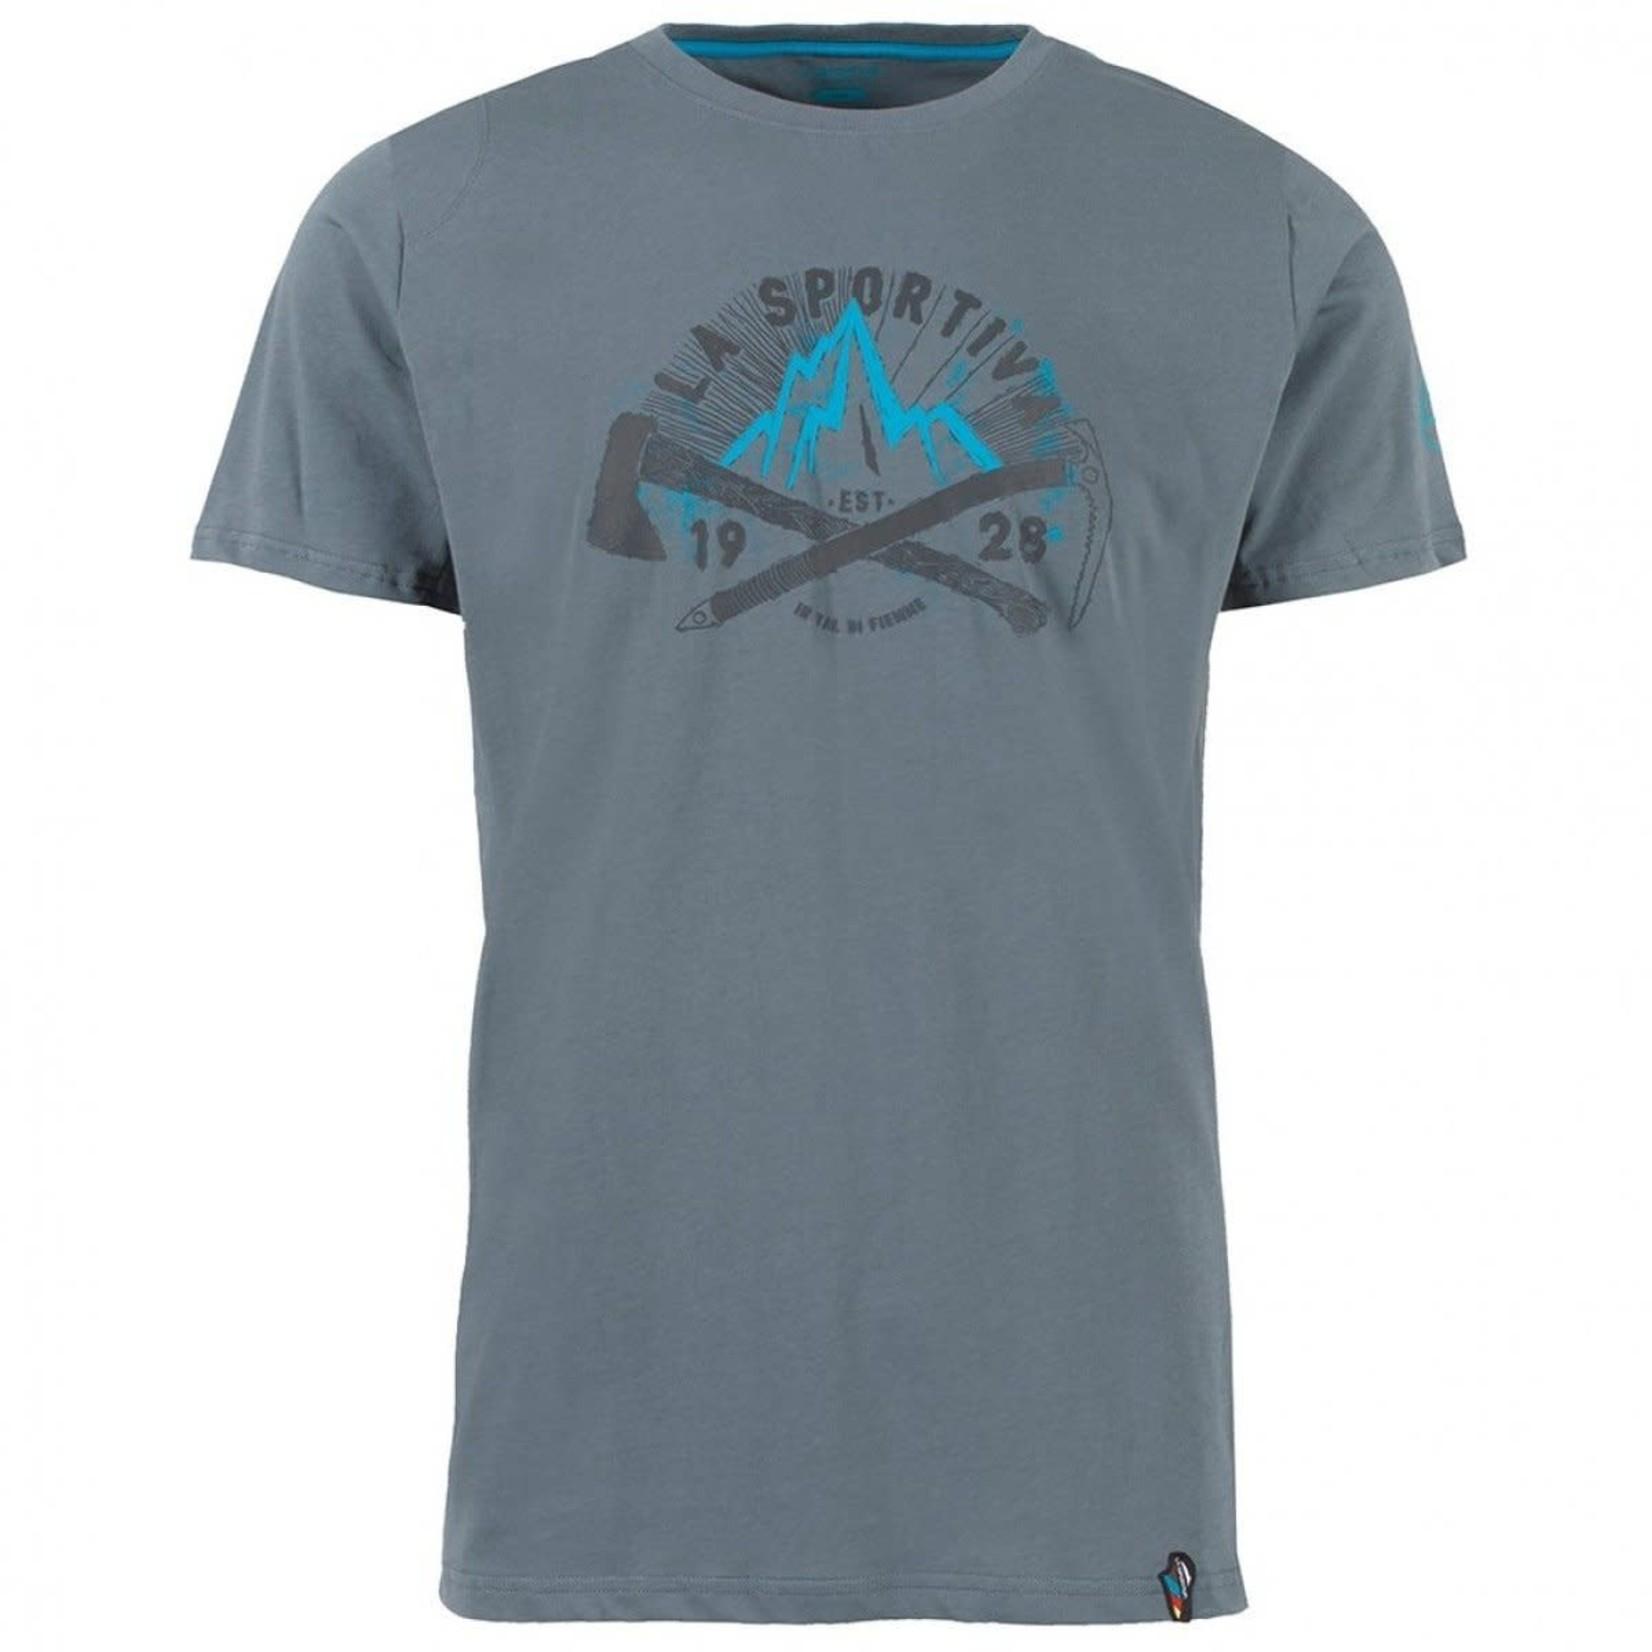 La Sportiva T-Shirt La Sportiva Hipster - Homme